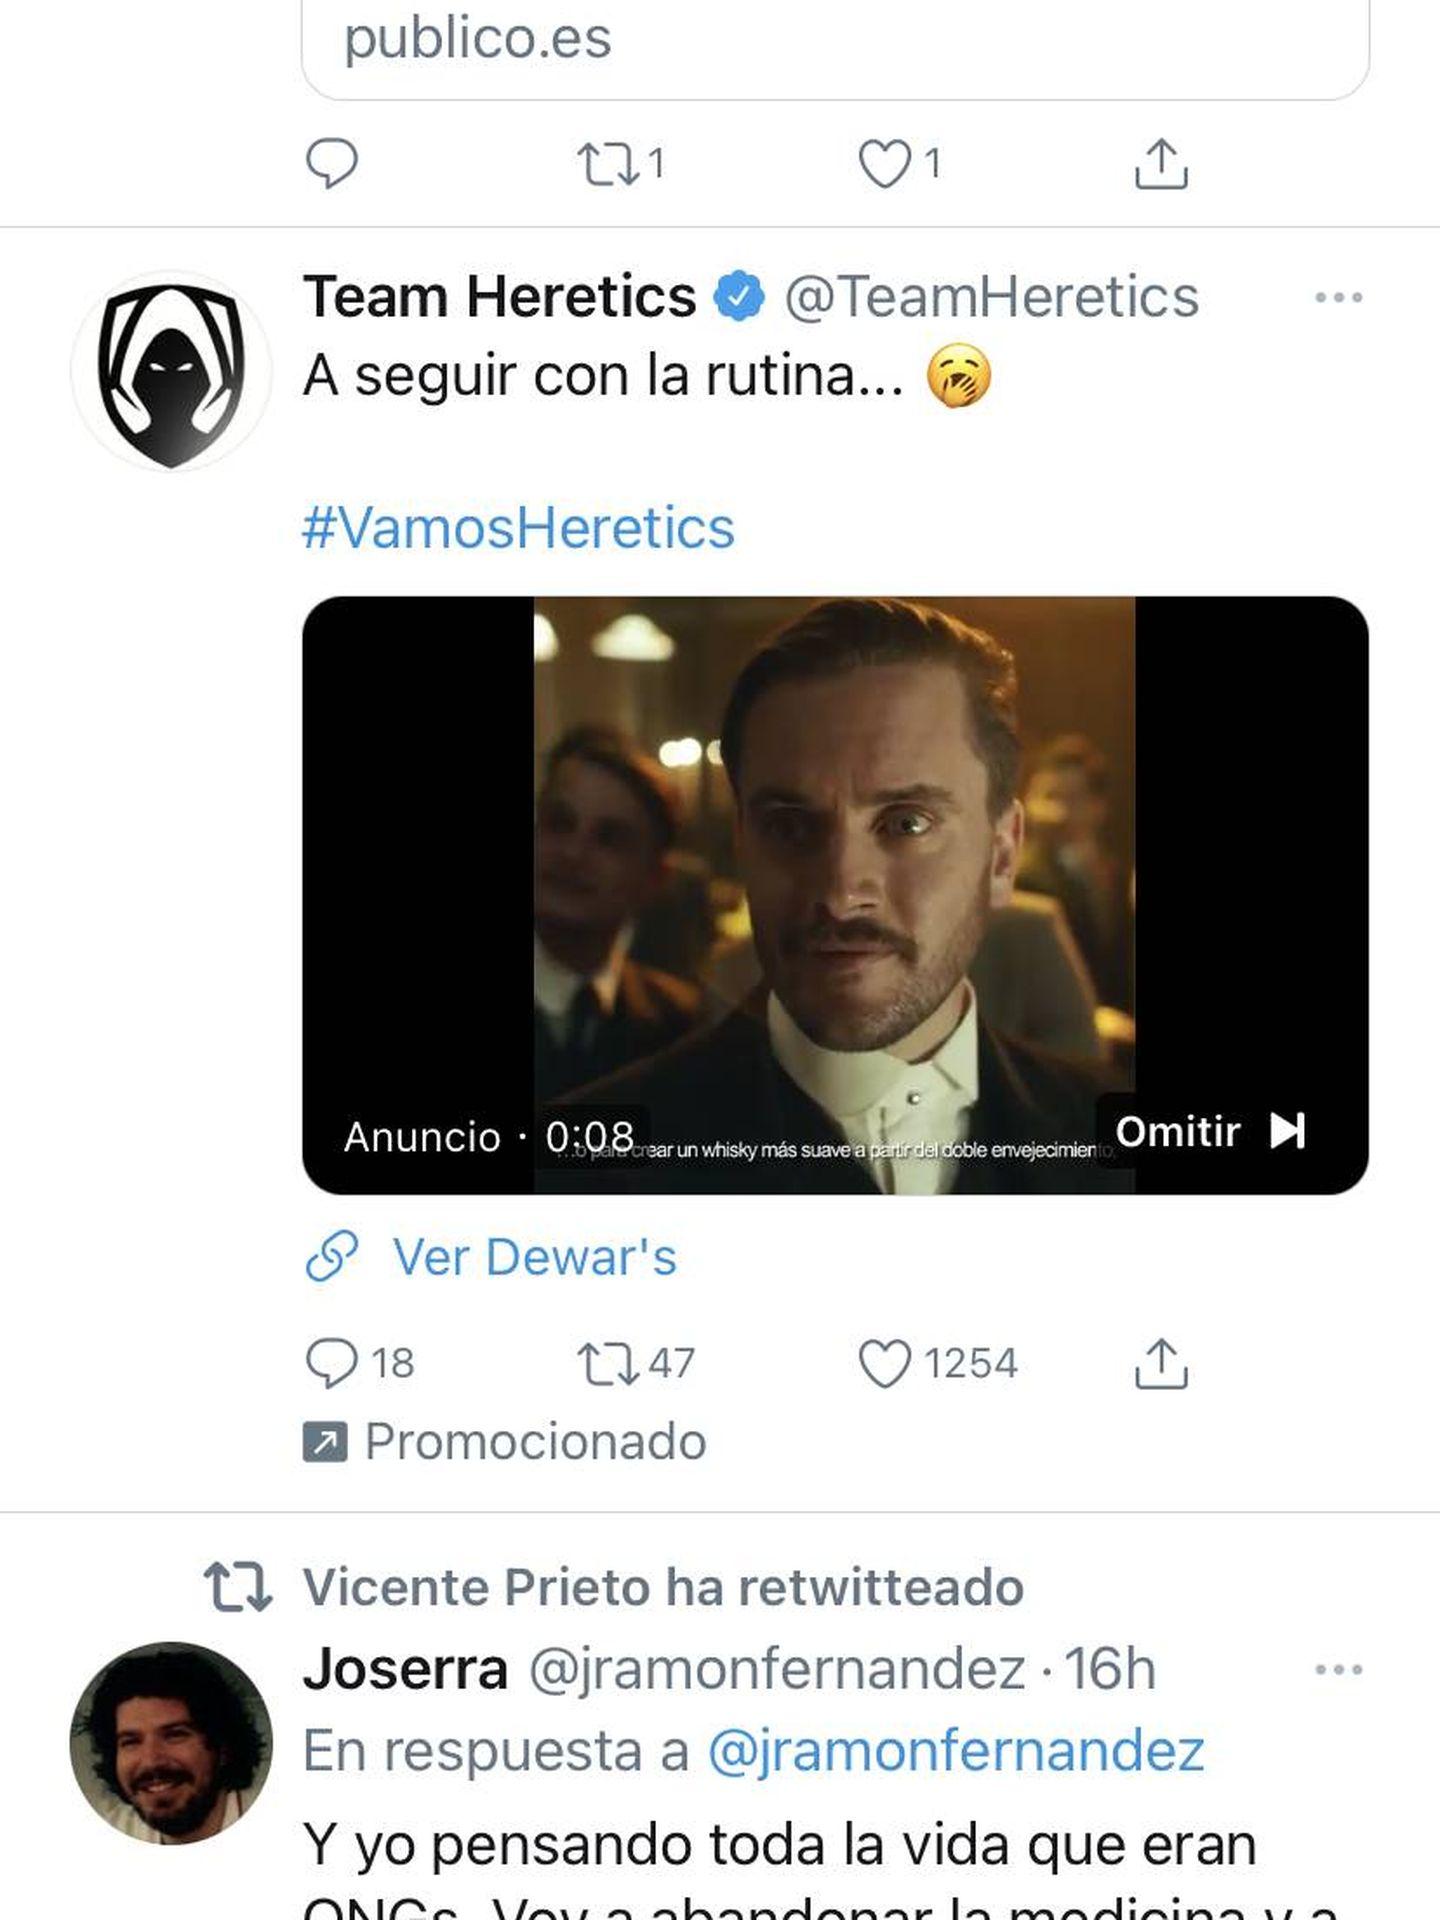 Tuit del club de 'e-sports' Team Heretics, promocionado por Dewars.